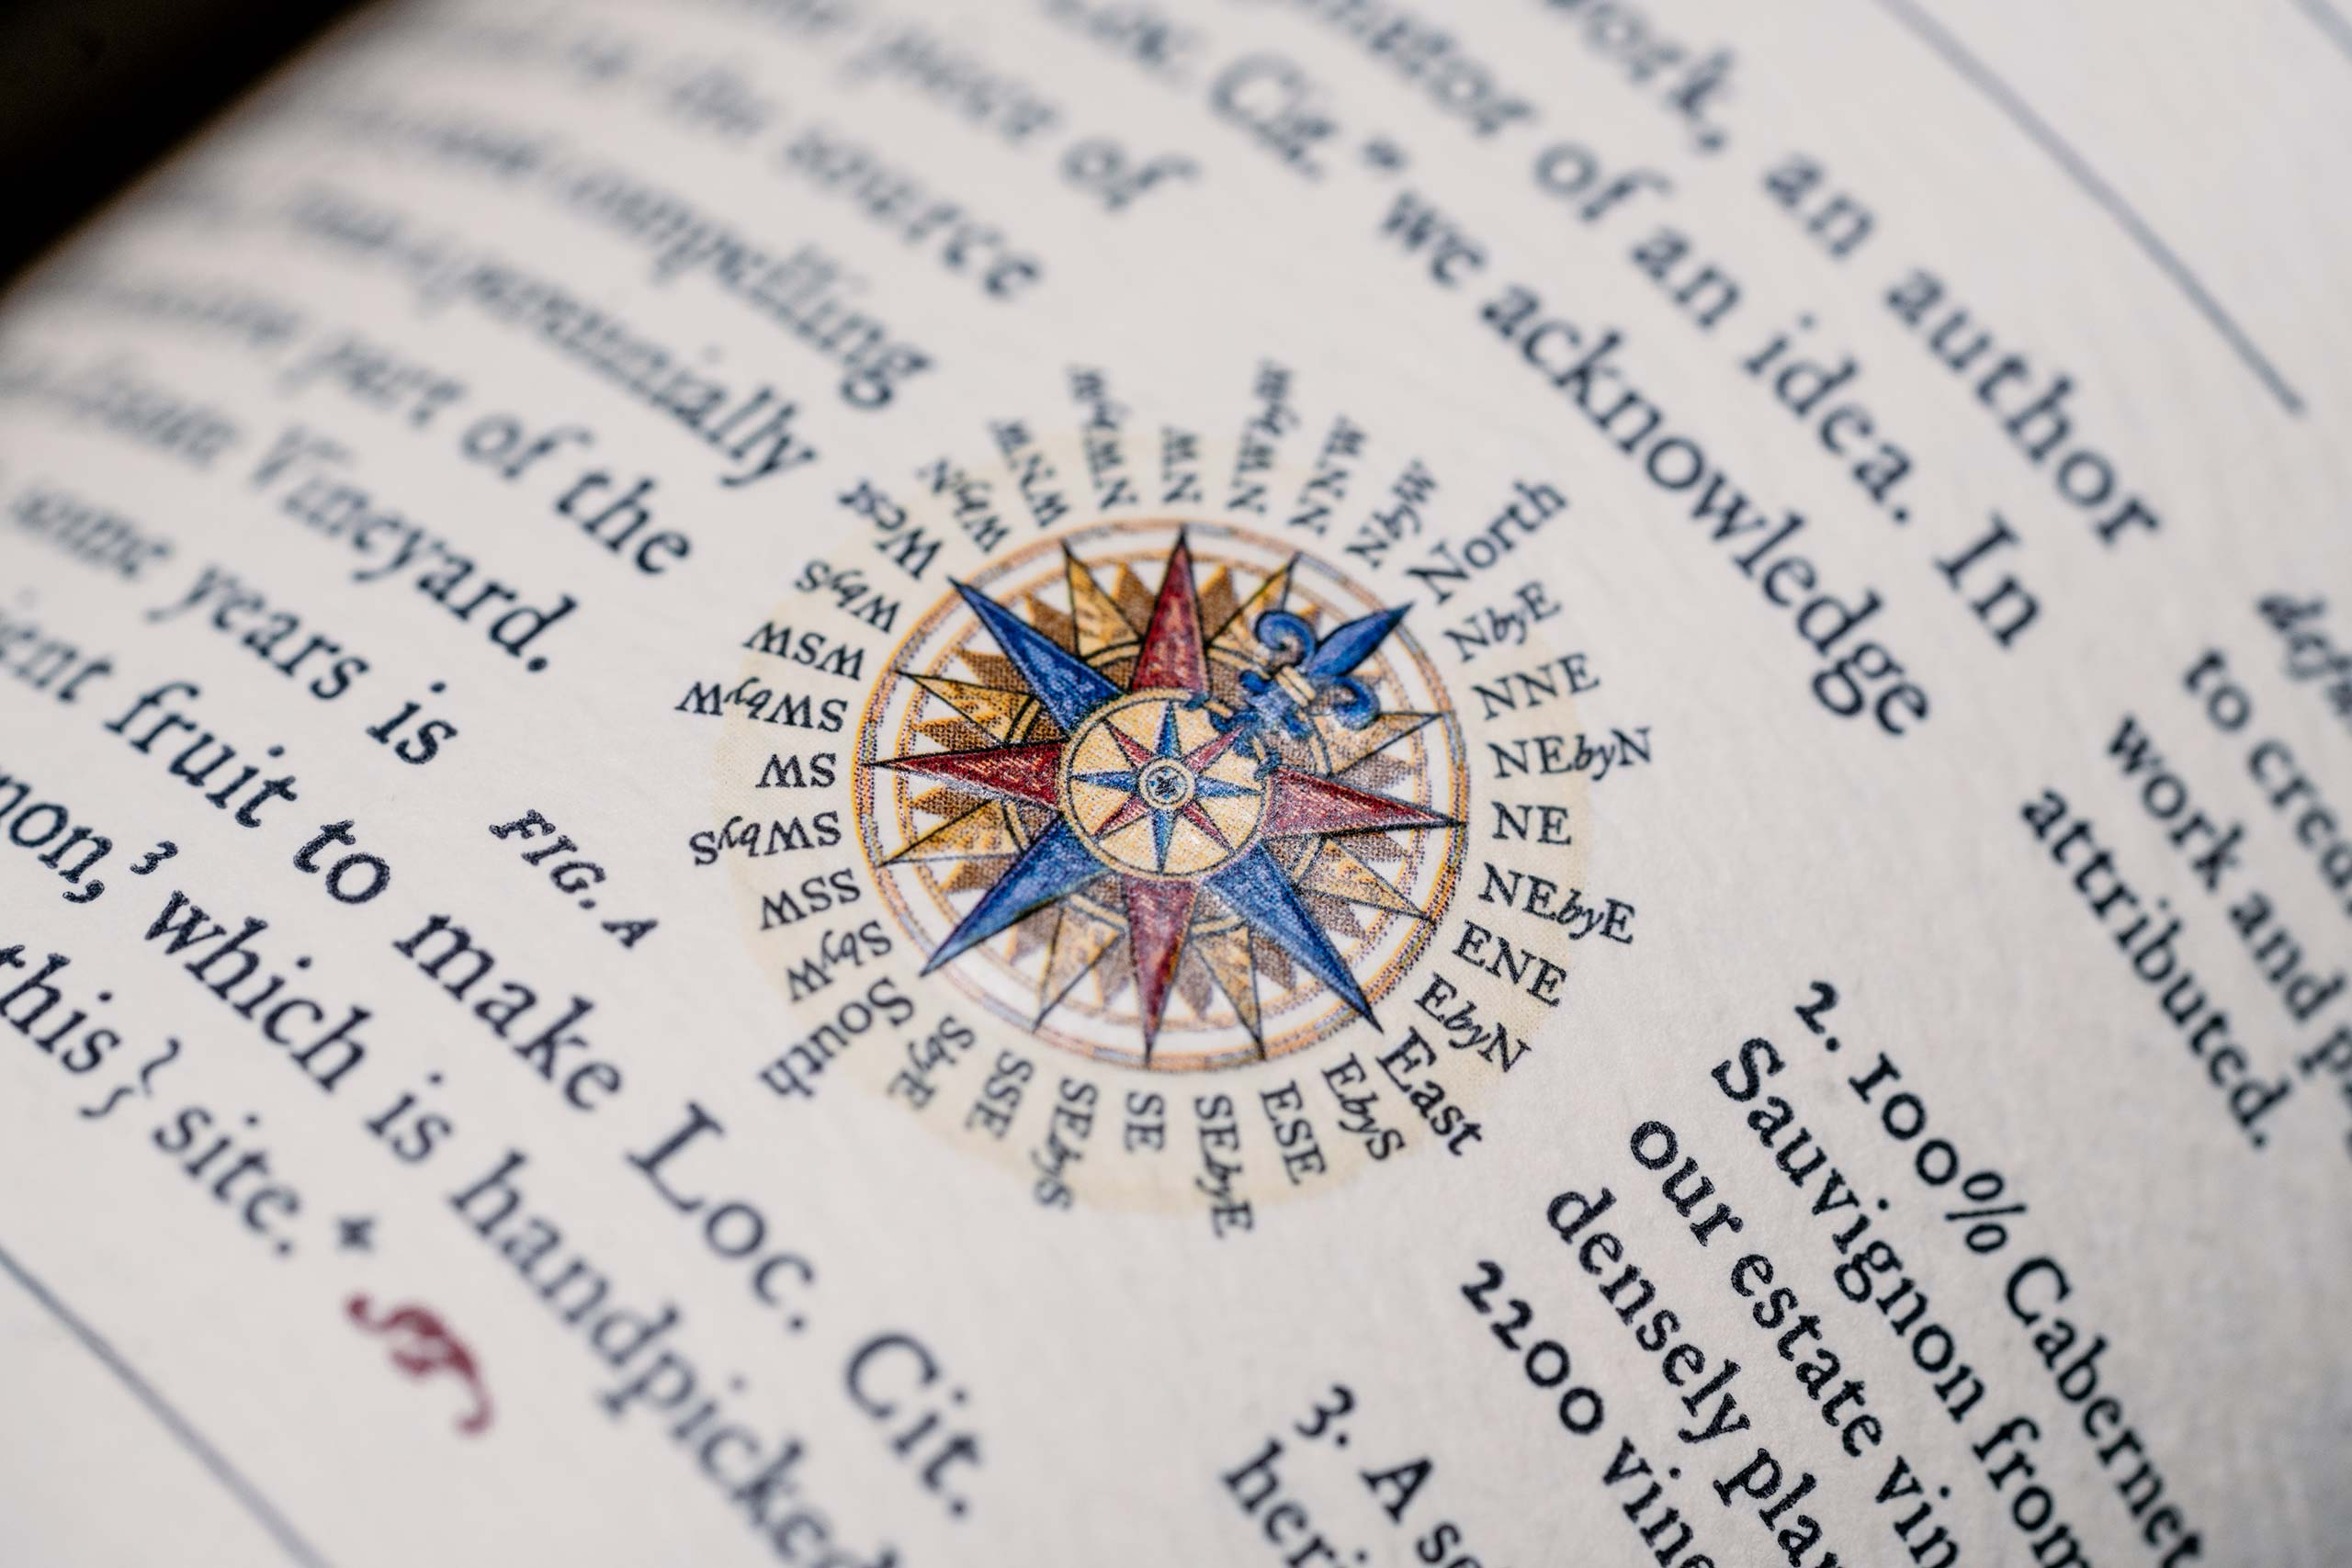 Loc. Cit. compass closeup